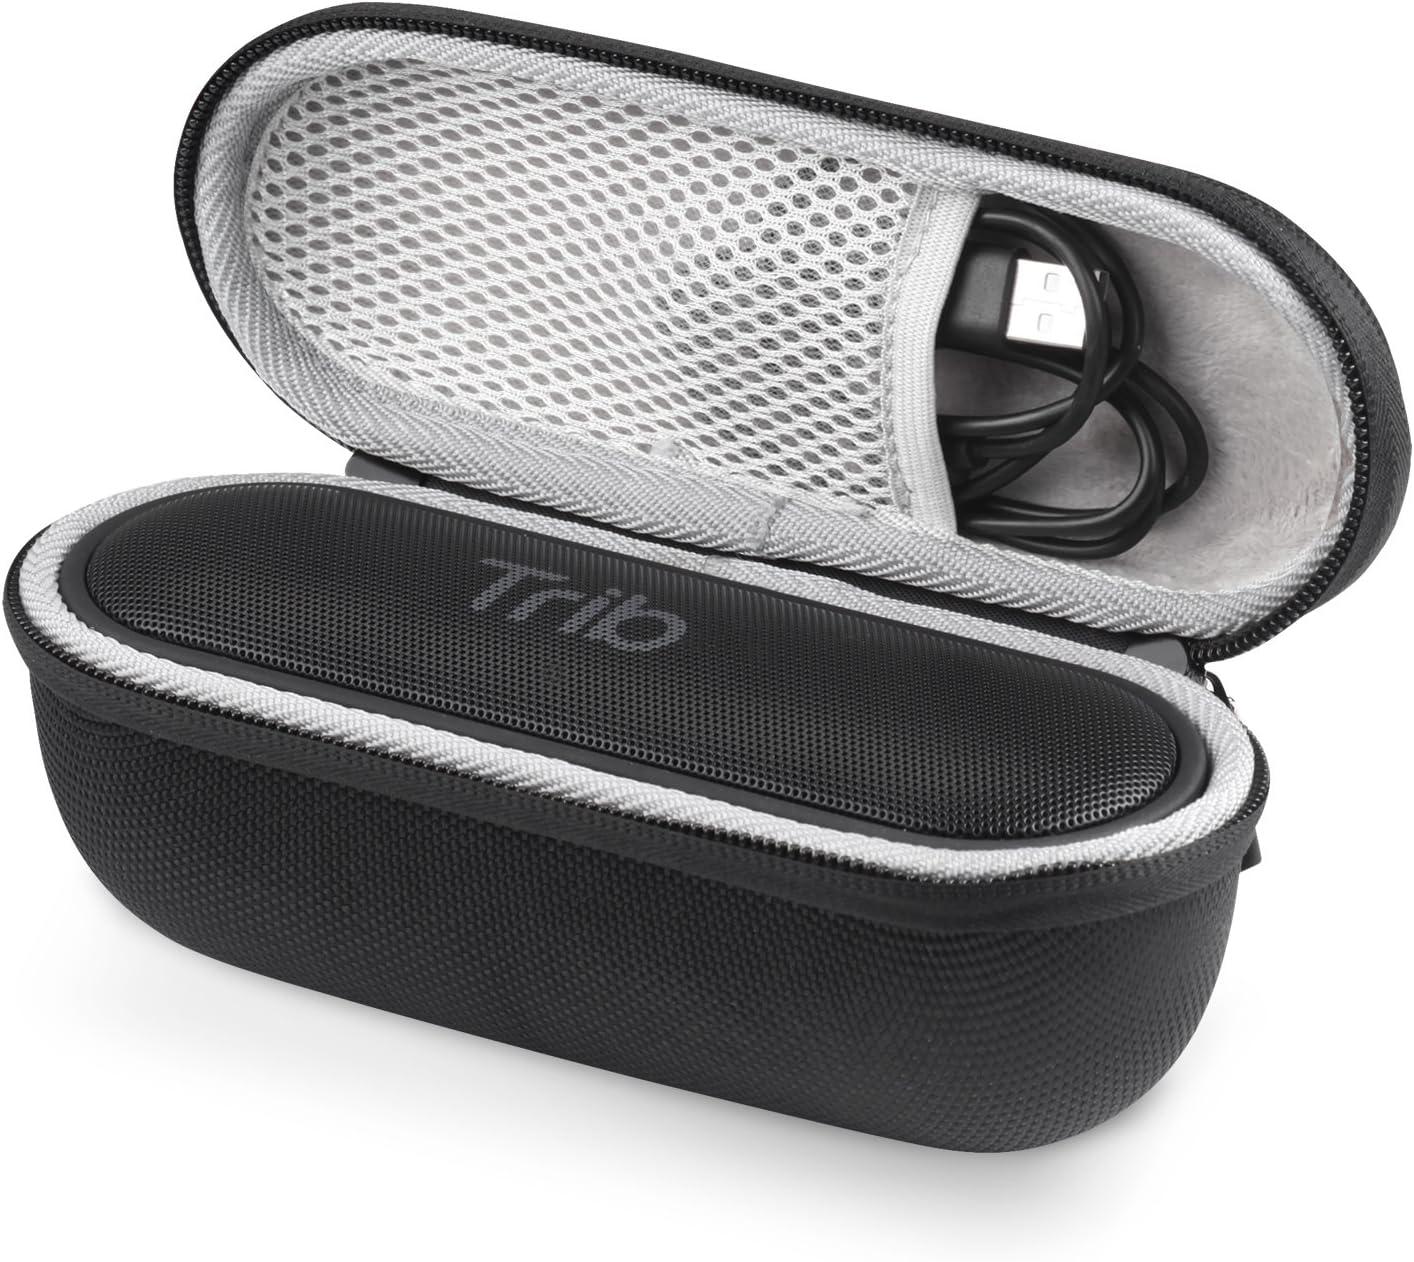 Tribit XSound Go Case, MaiYi Hard EVA Travel Carrying Case Protective Storage Bag for Tribit XSound Go Portable Bluetooth Speaker